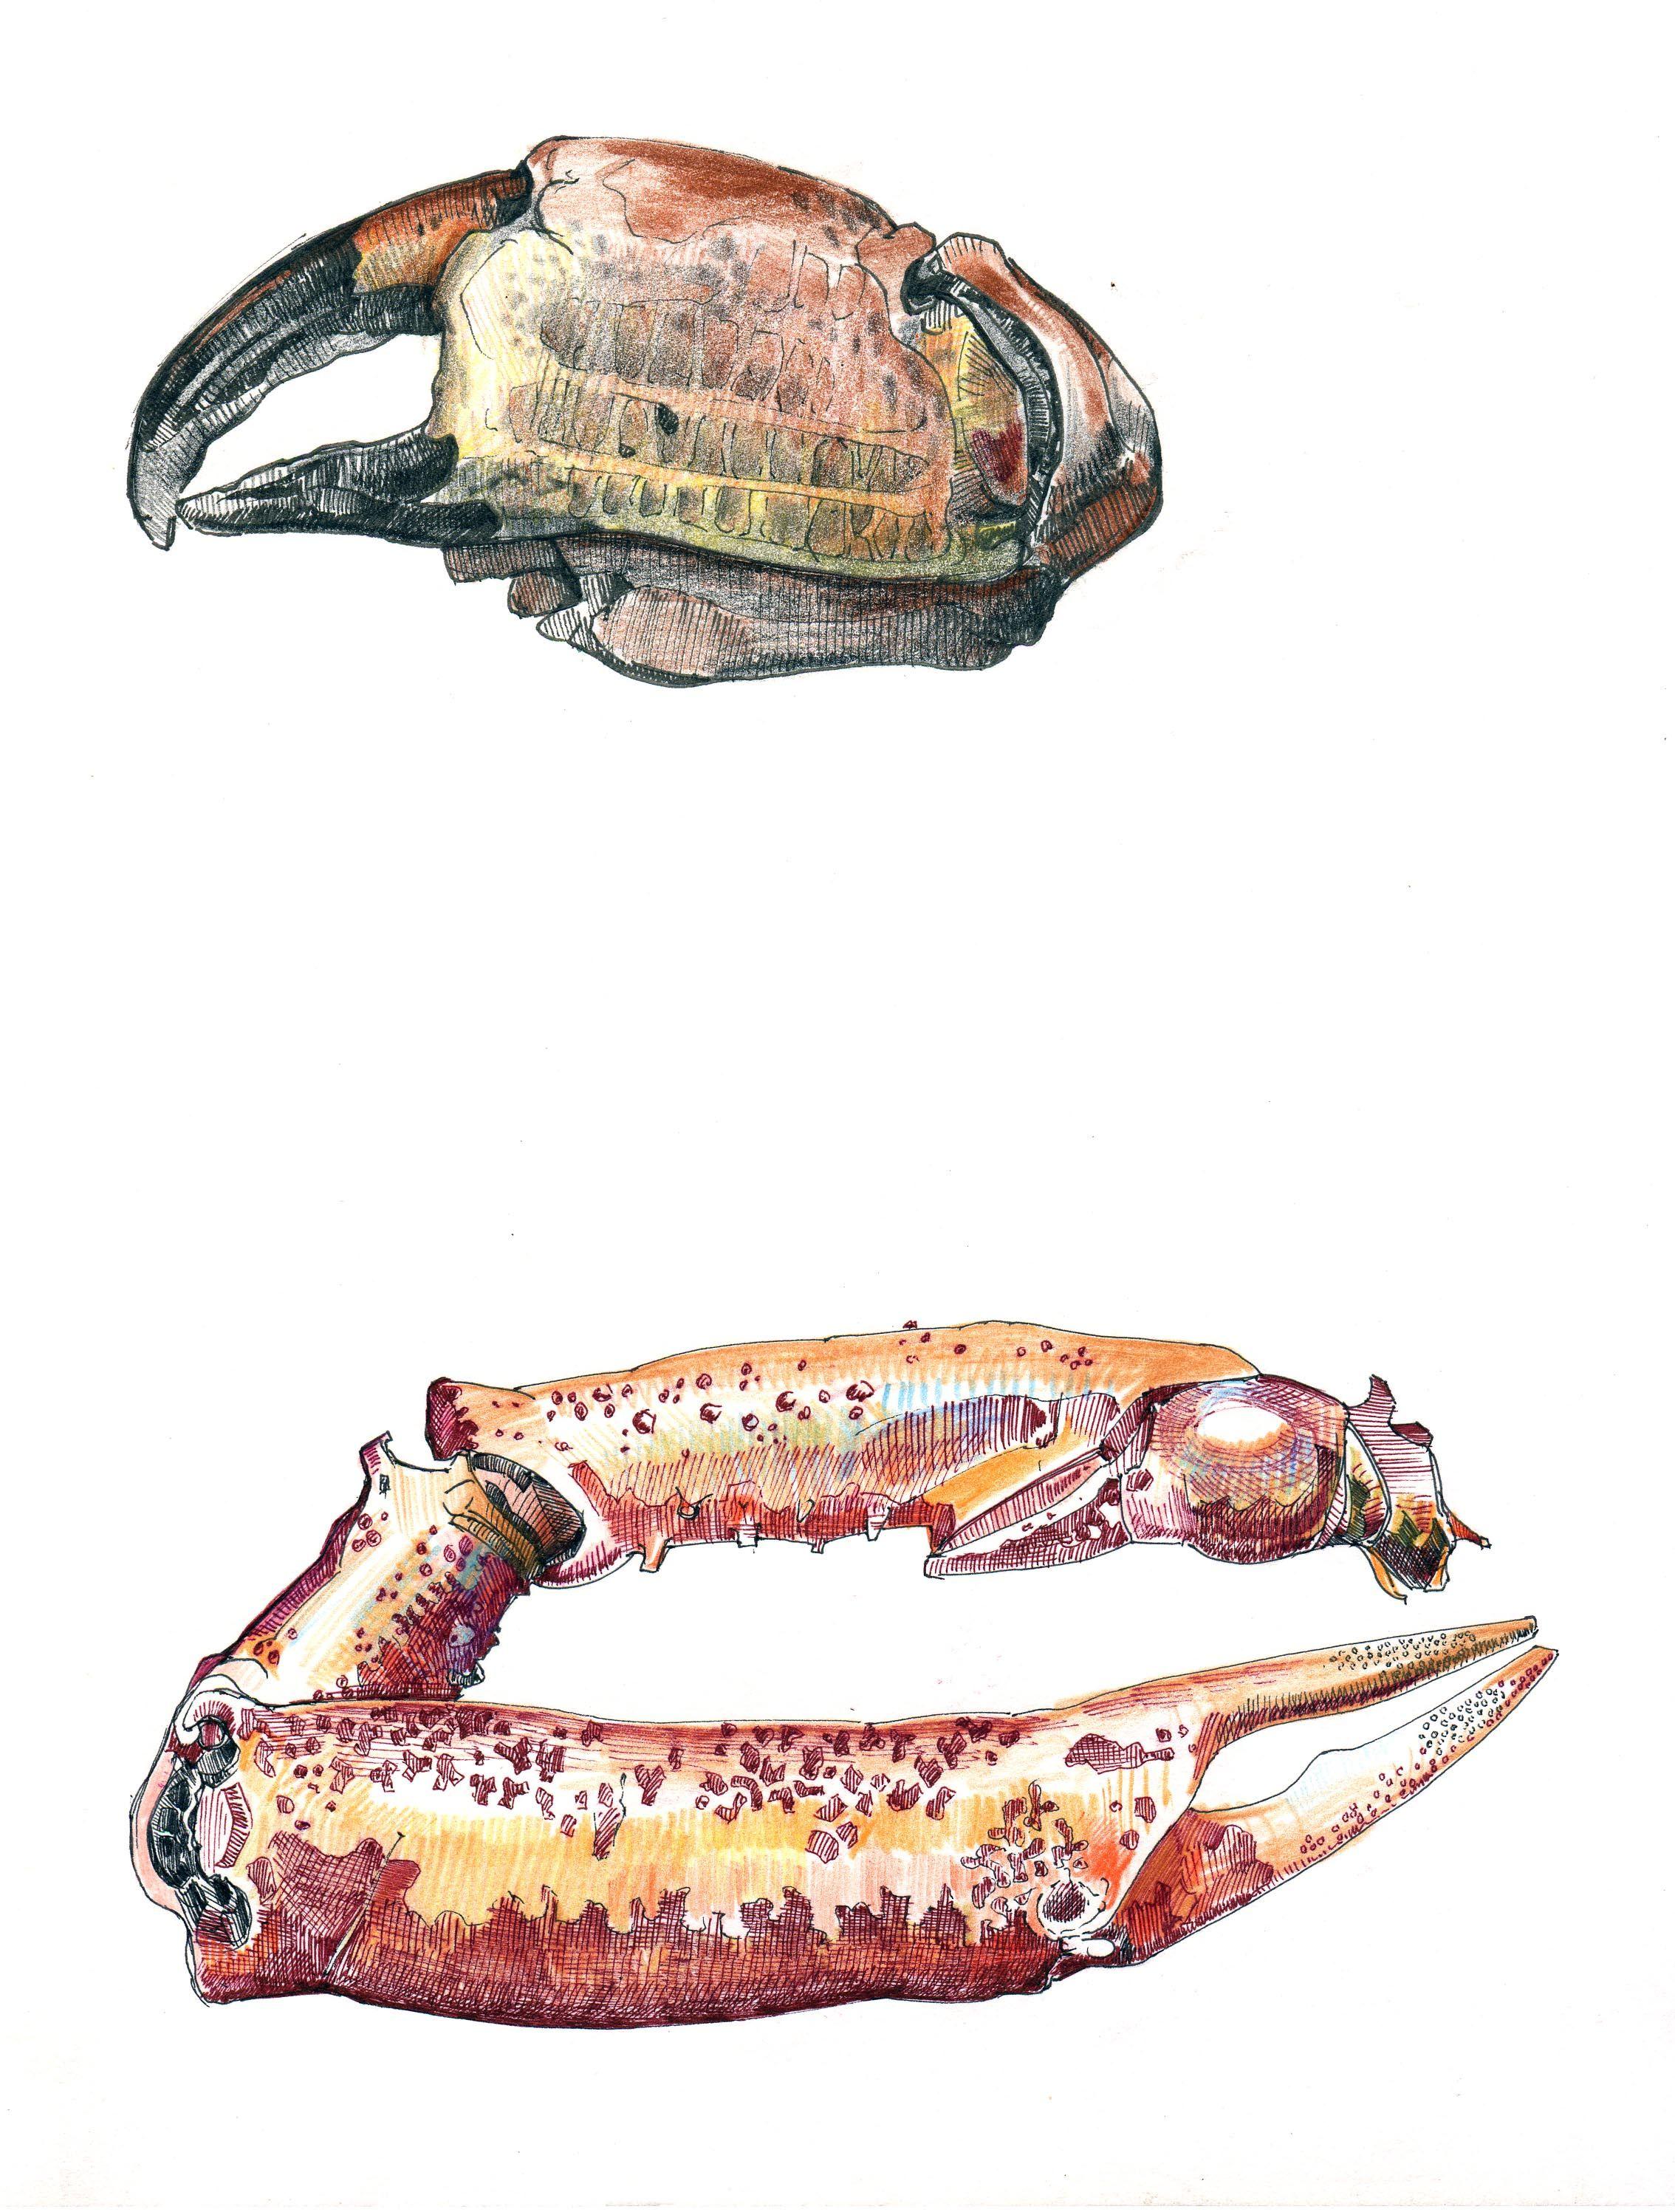 Crab claw sketchbook studies. UK Artist: Duncan Cameron